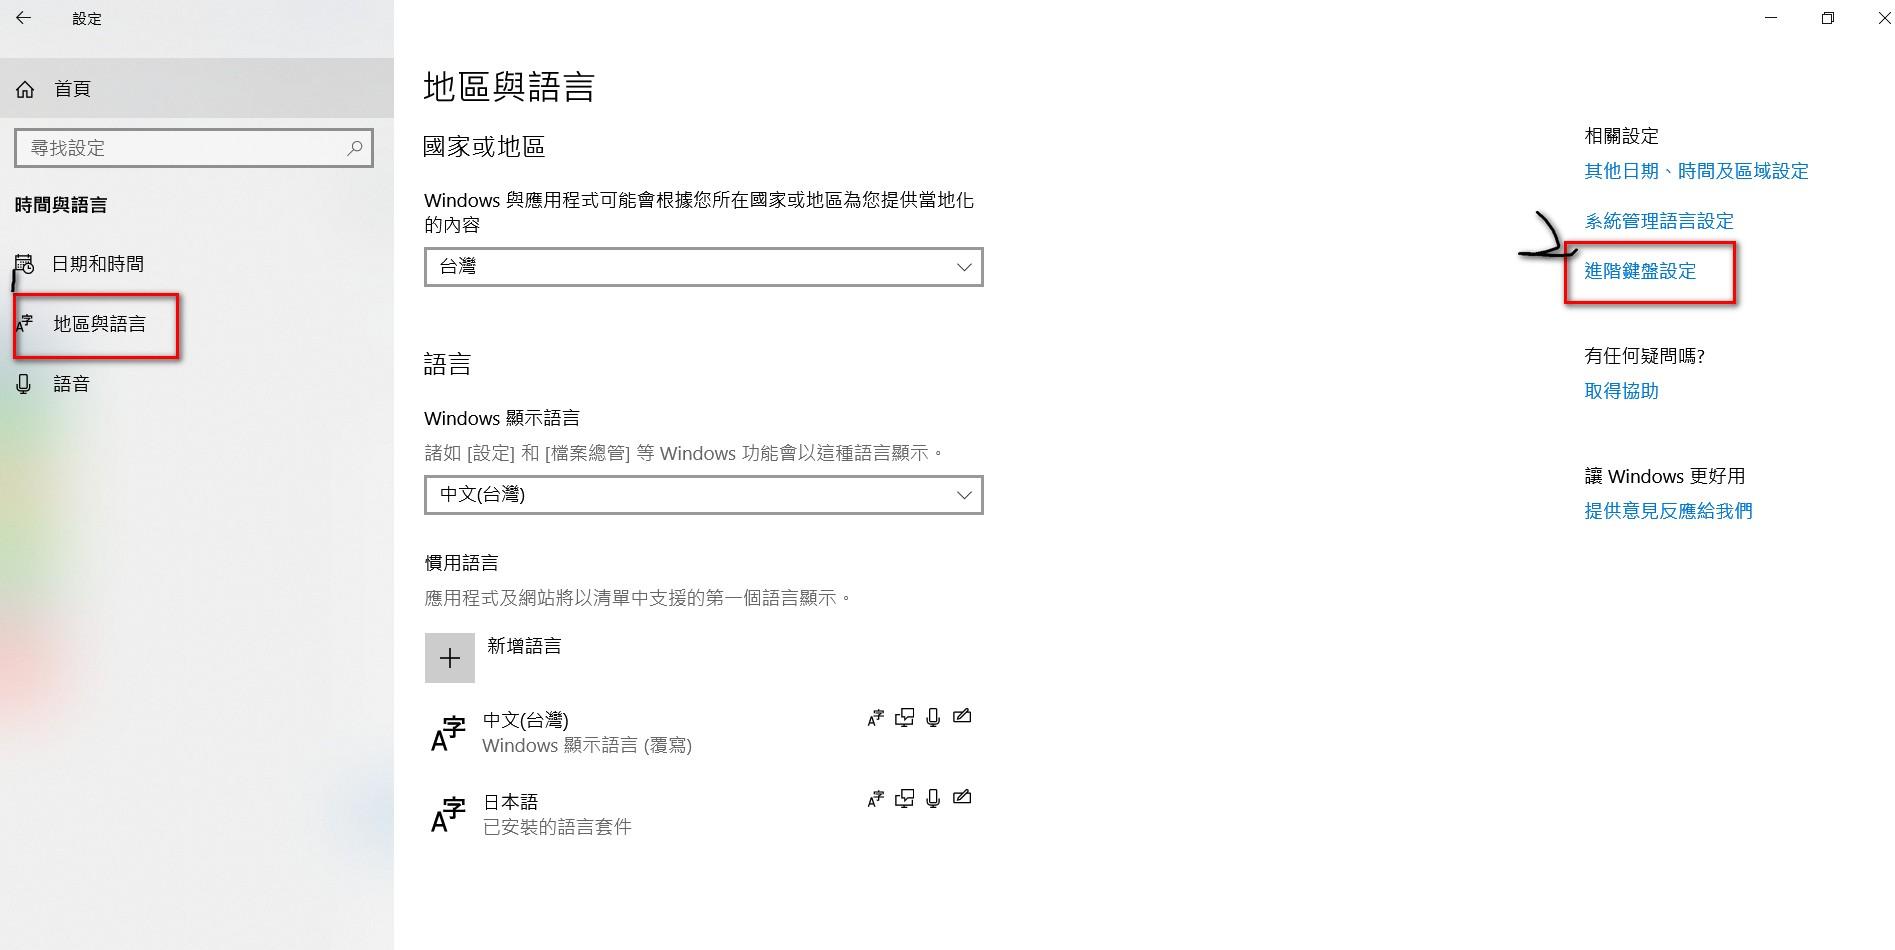 W10系統 中文錯誤 無法輸入 修復 -阡景